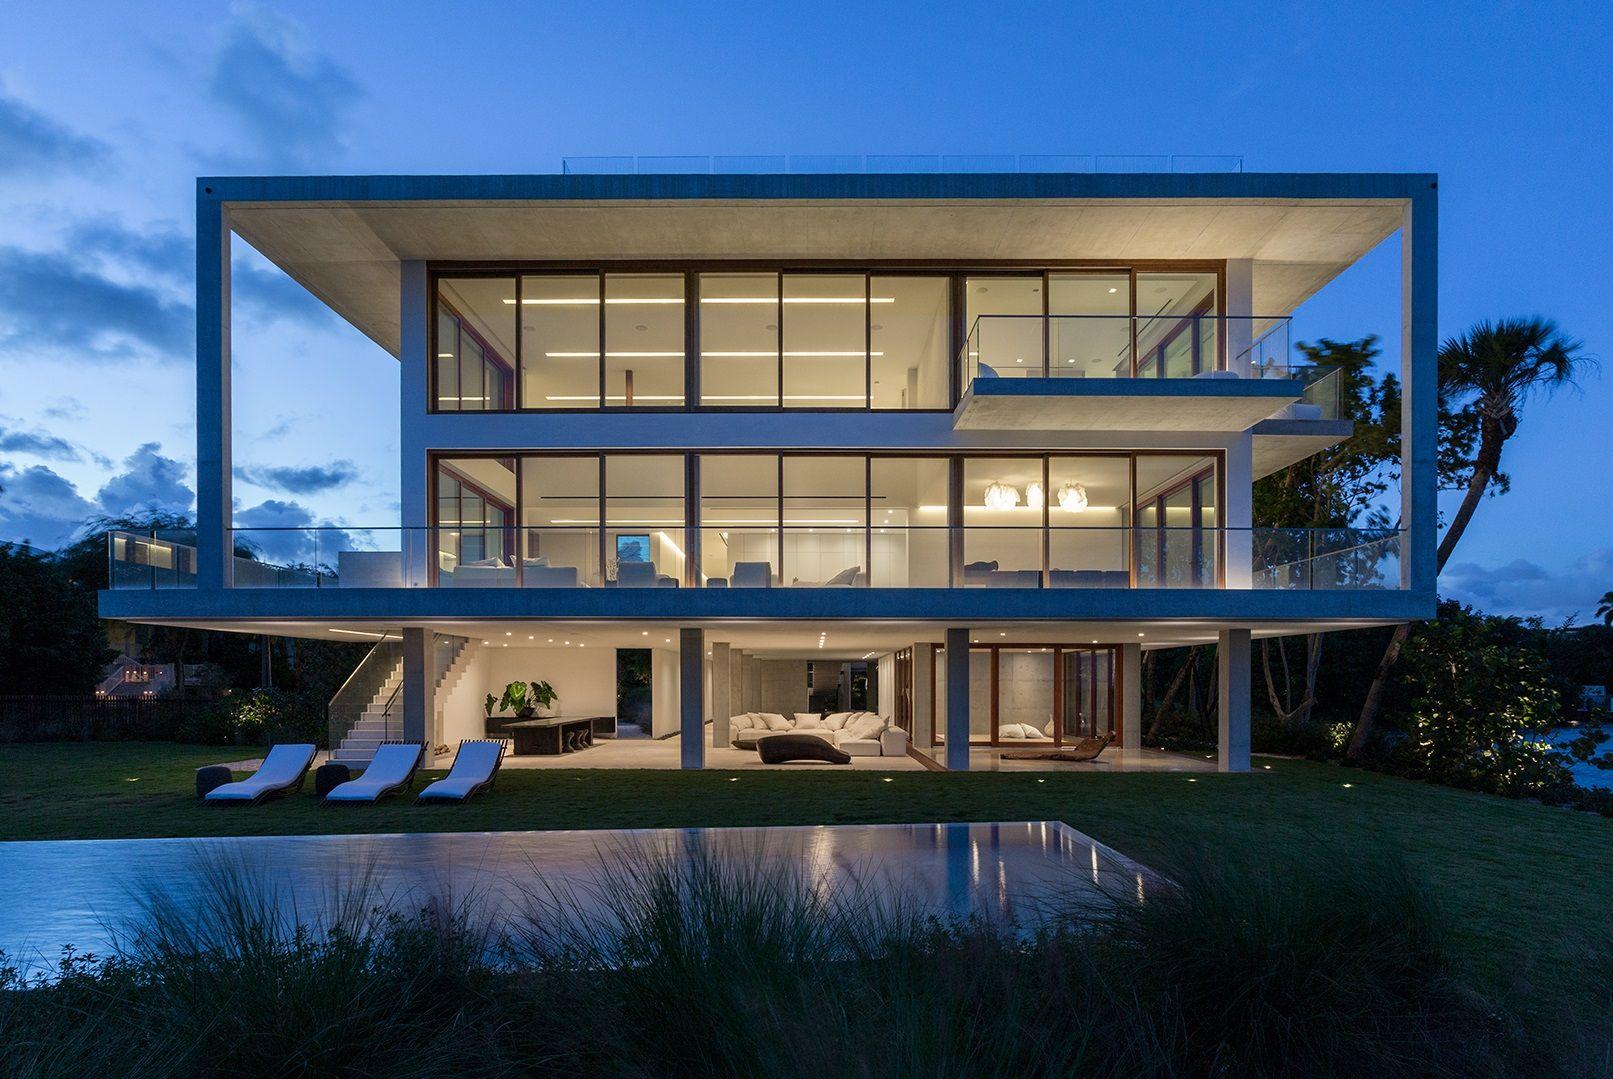 casa bahia miami Casa Bahia Casa Bahia: A bit of Brazilian modernism in Miami Casa Bahia Miami 5